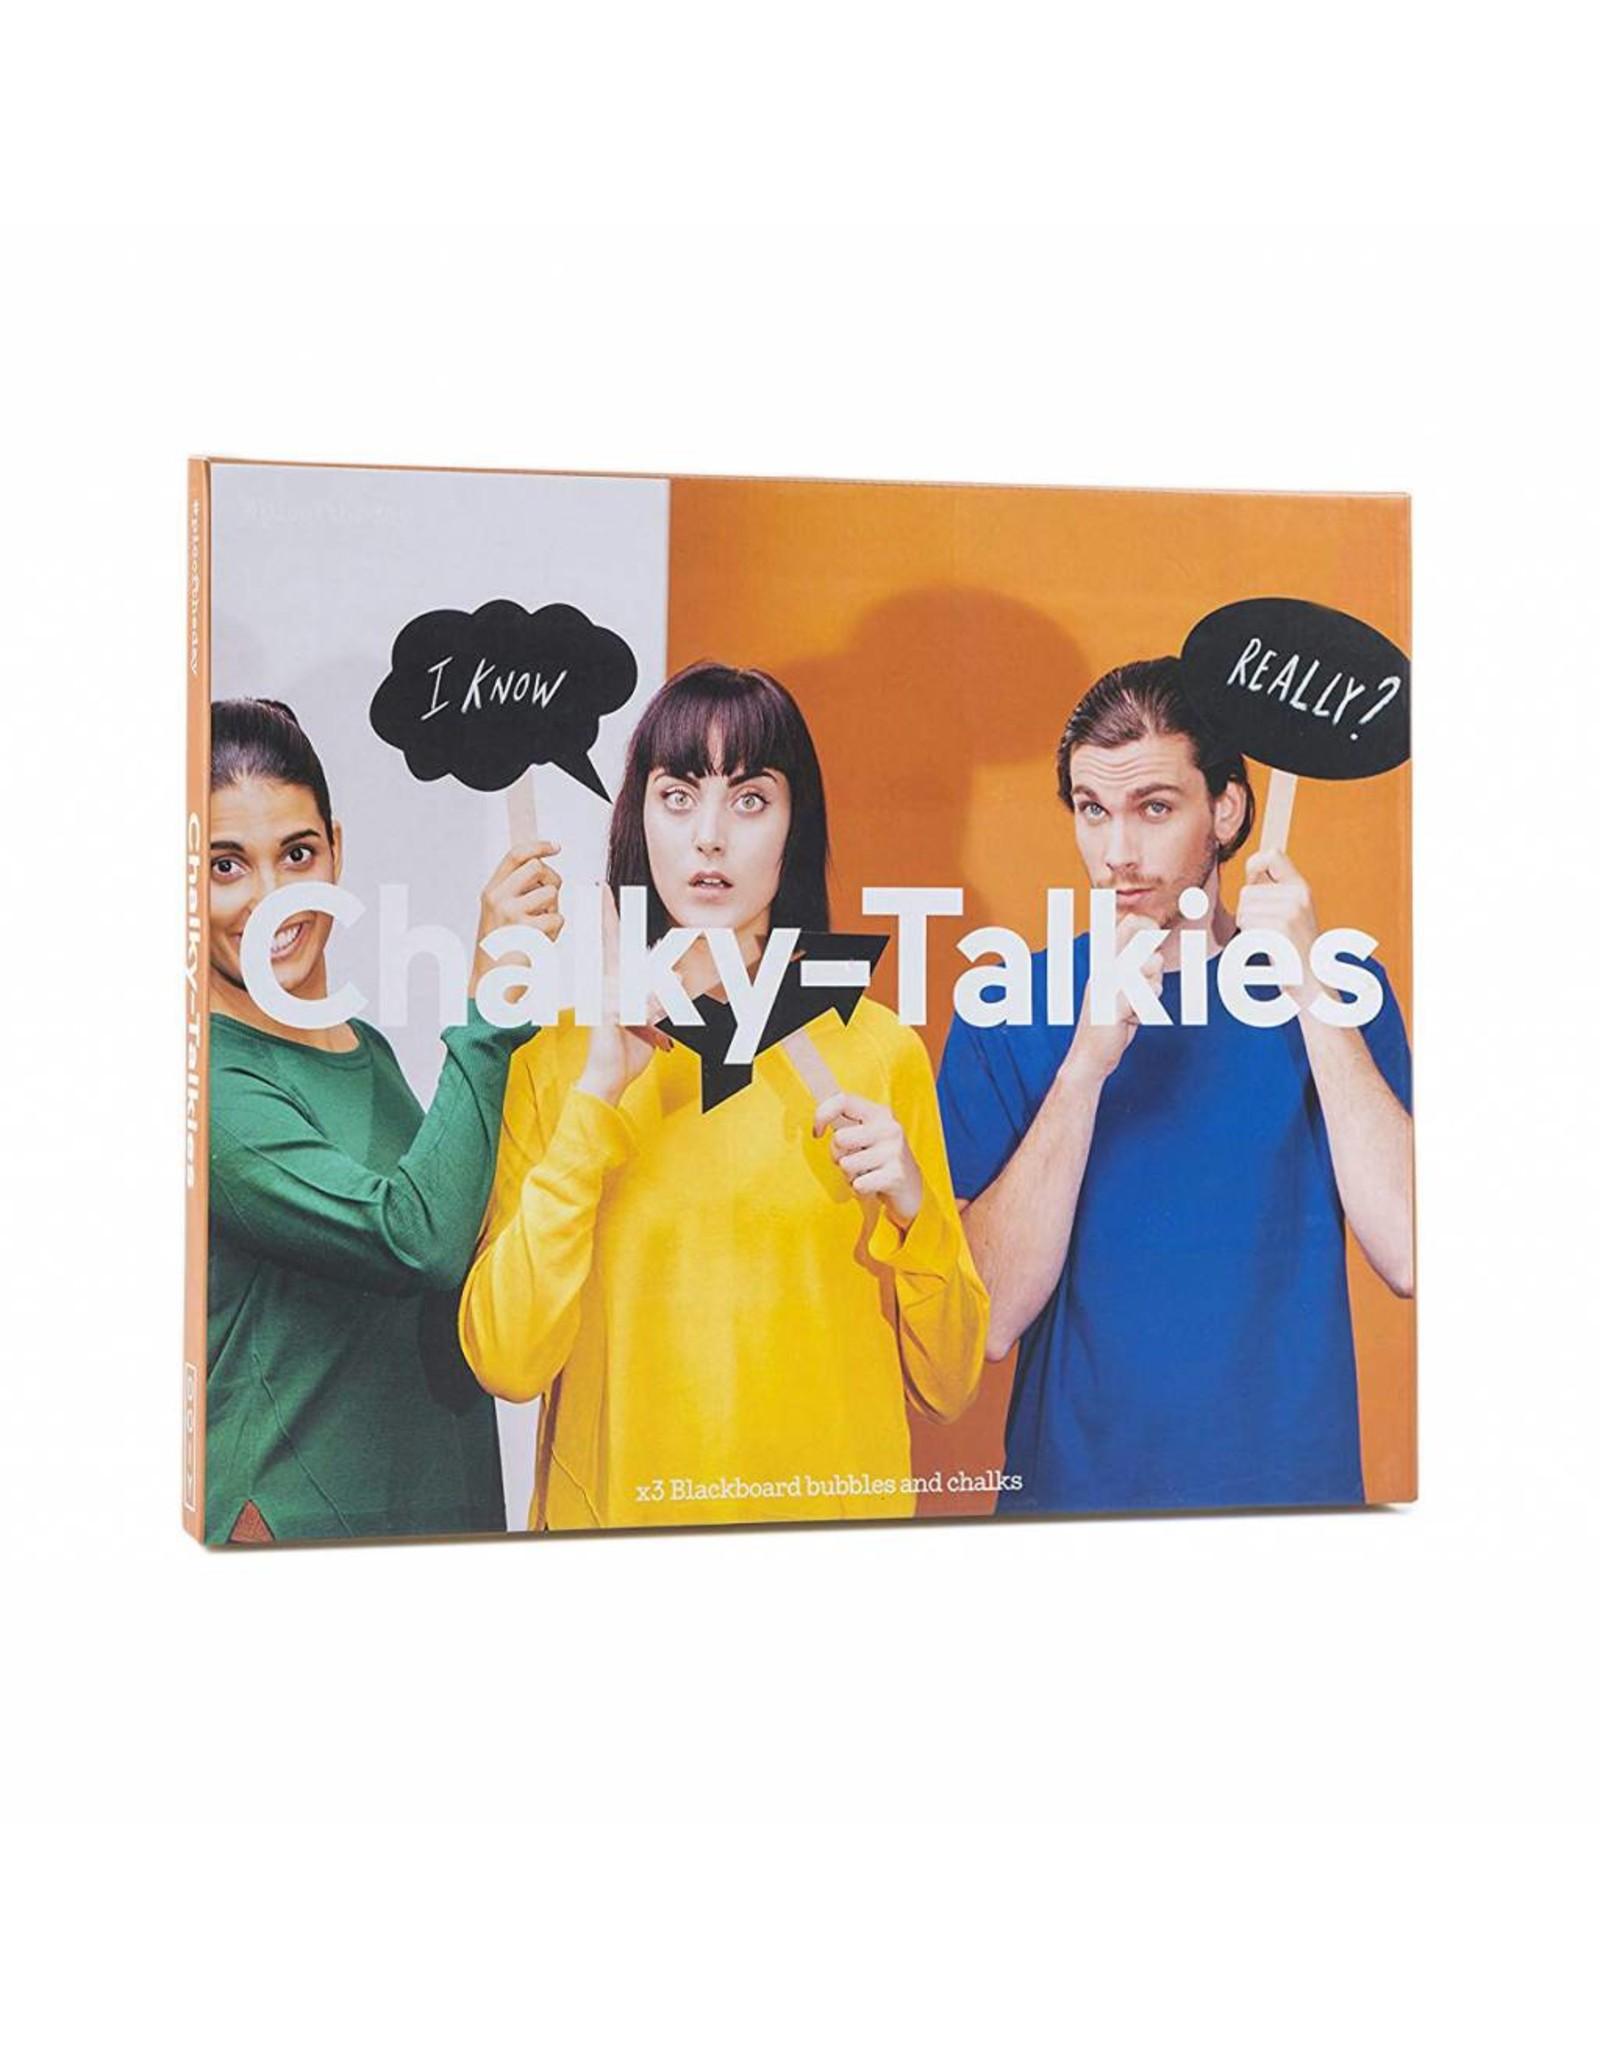 Chalky-talkies 3st